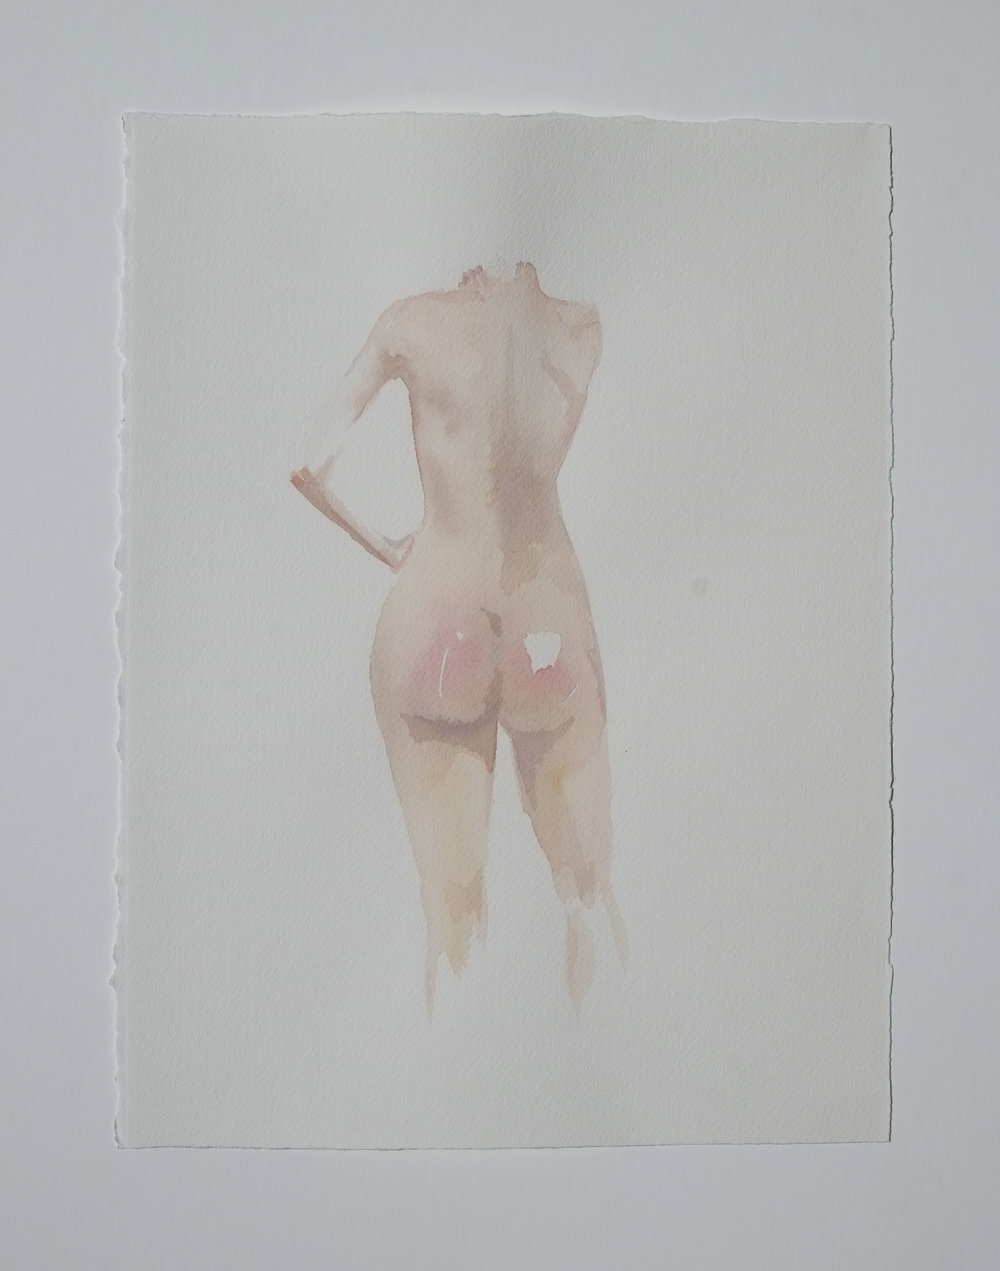 painting_april2017_0004_302.JPG